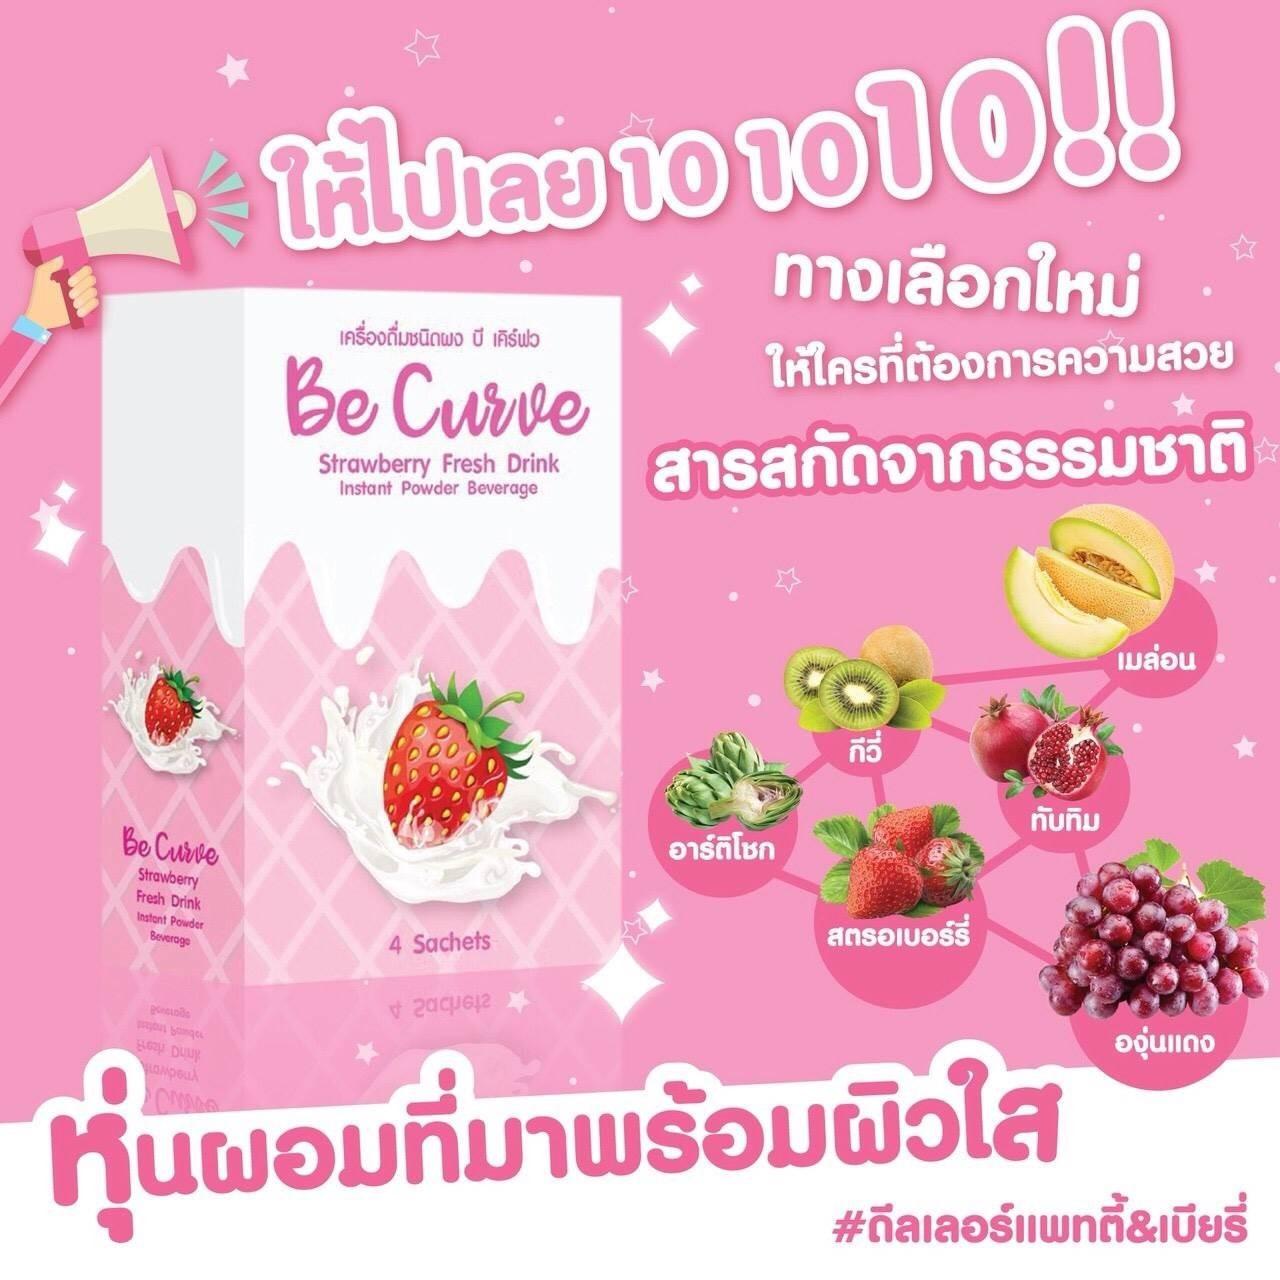 Be Curve บีเคิร์ฟว ลดน้ำหนัก By เบลล่า 4 ซอง